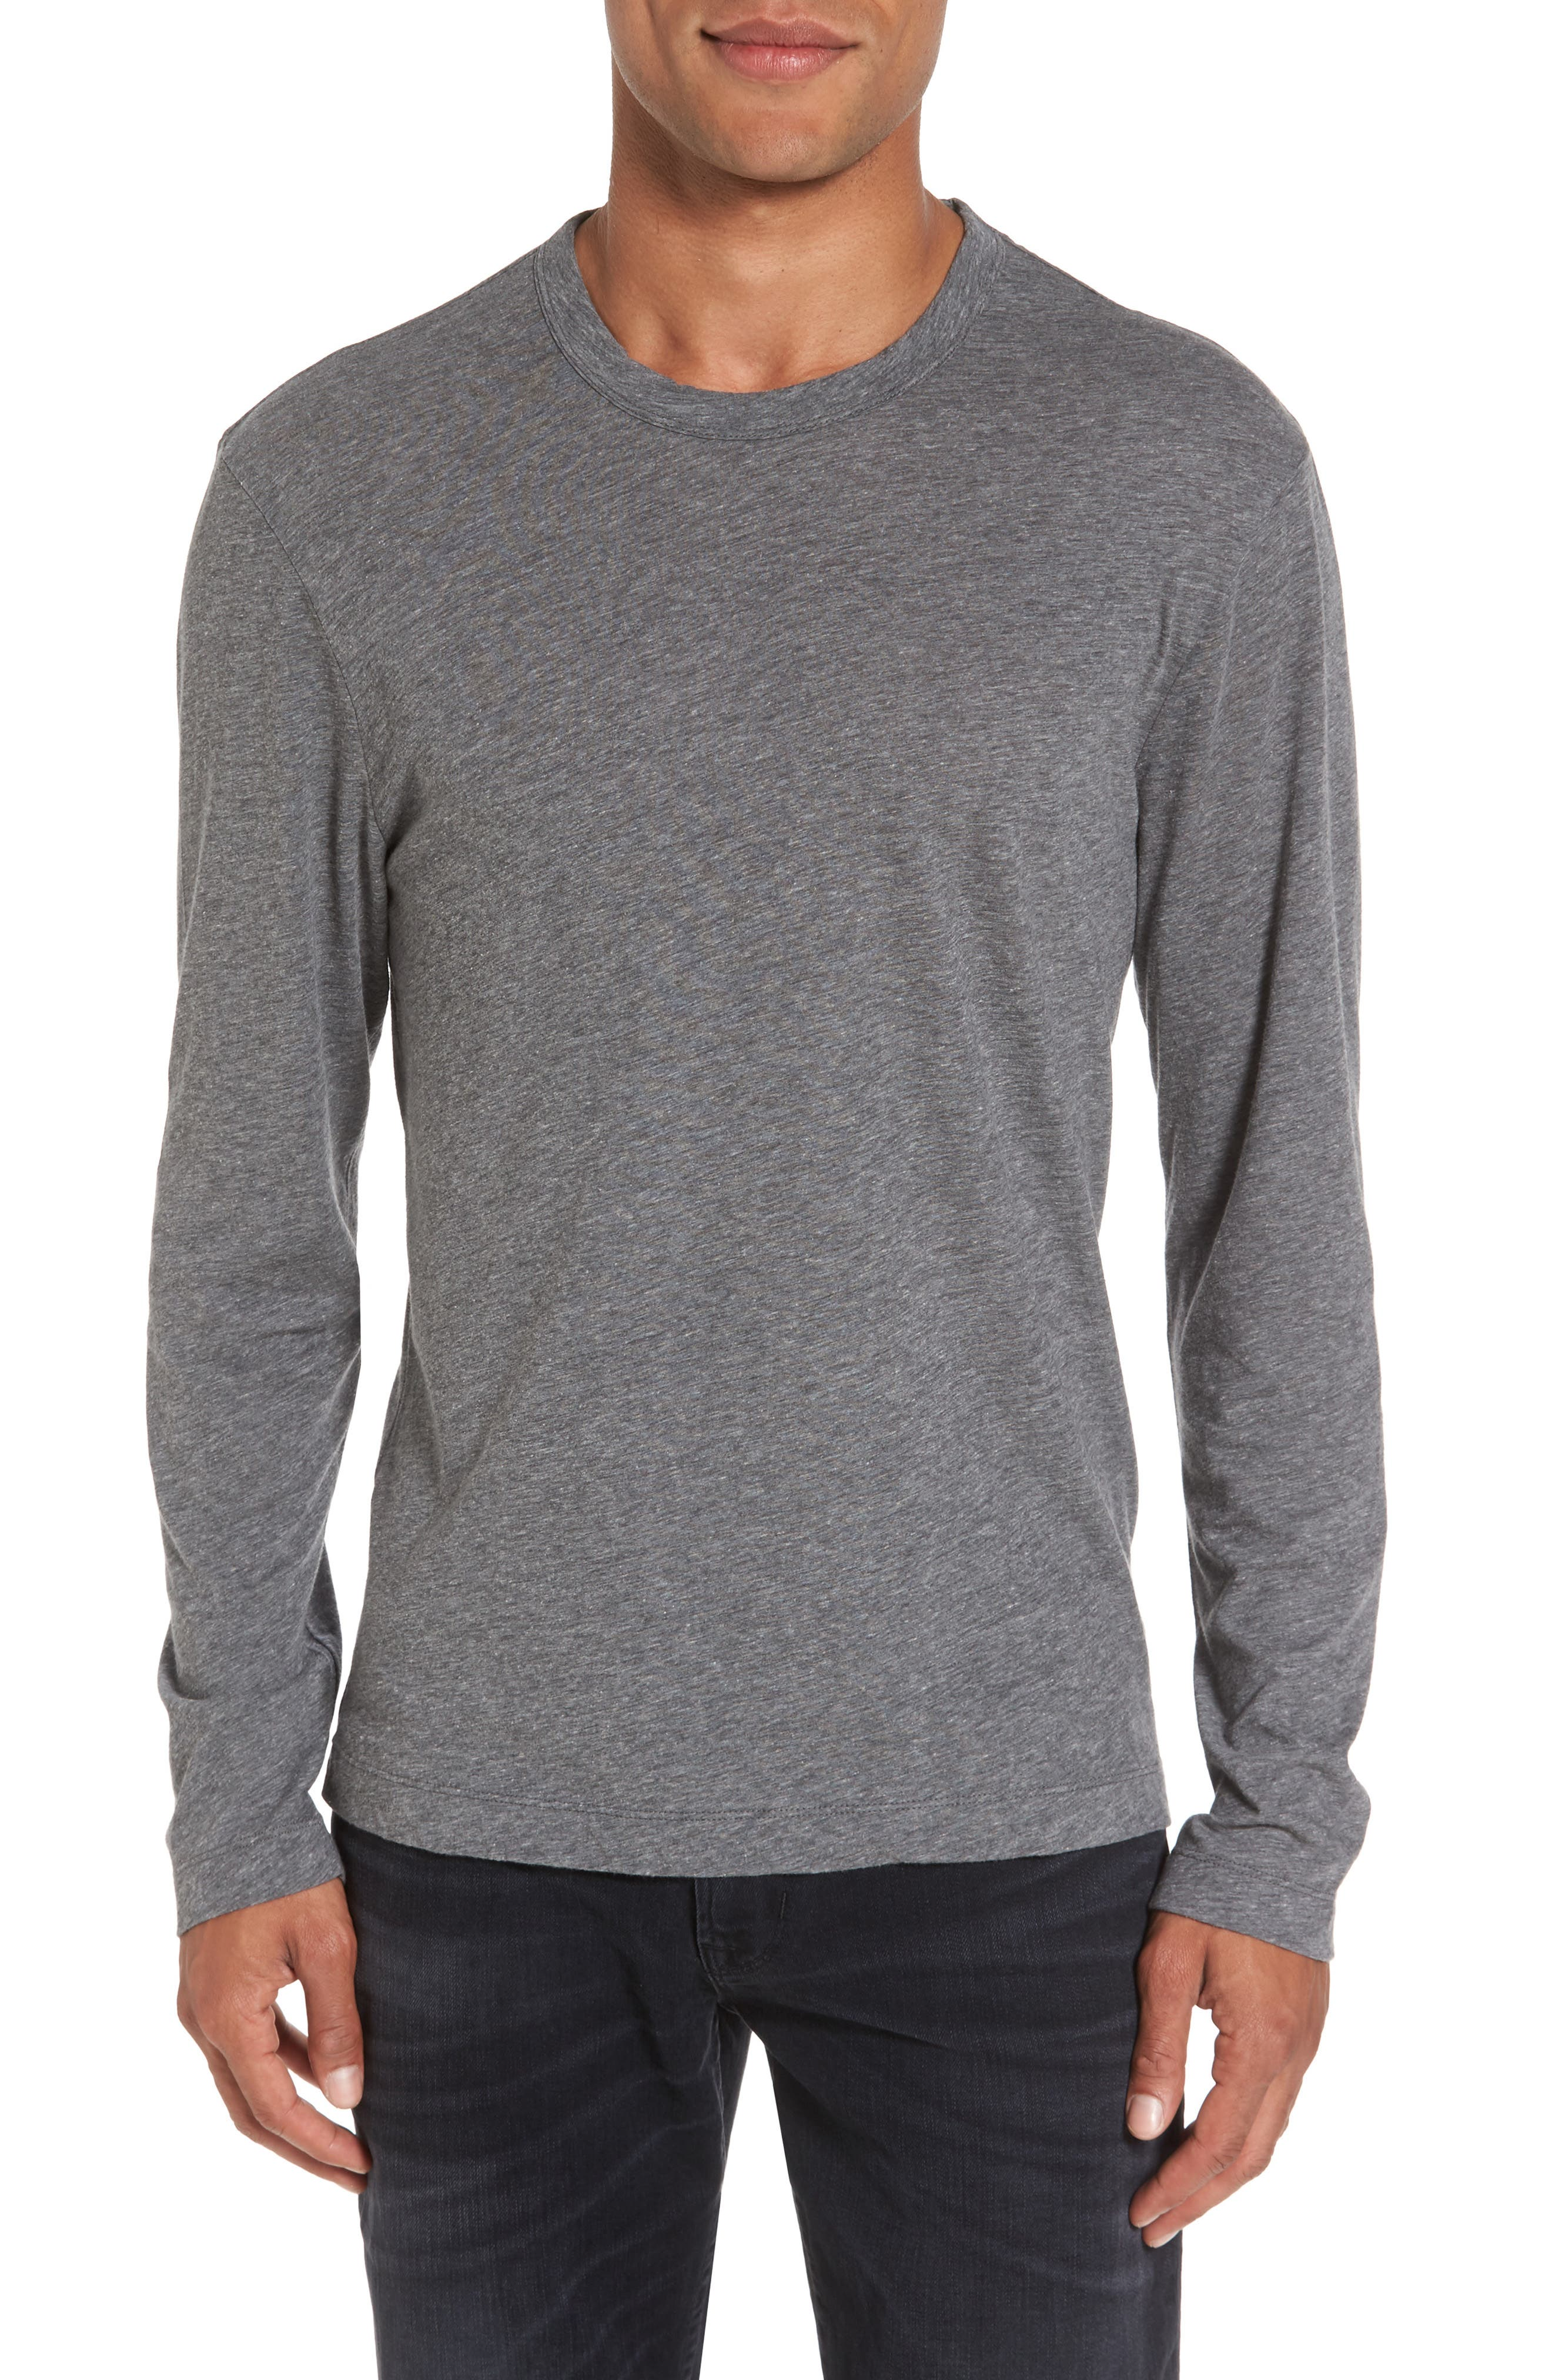 Alternate Image 1 Selected - James Perse Mélange Knit Long Sleeve T-Shirt